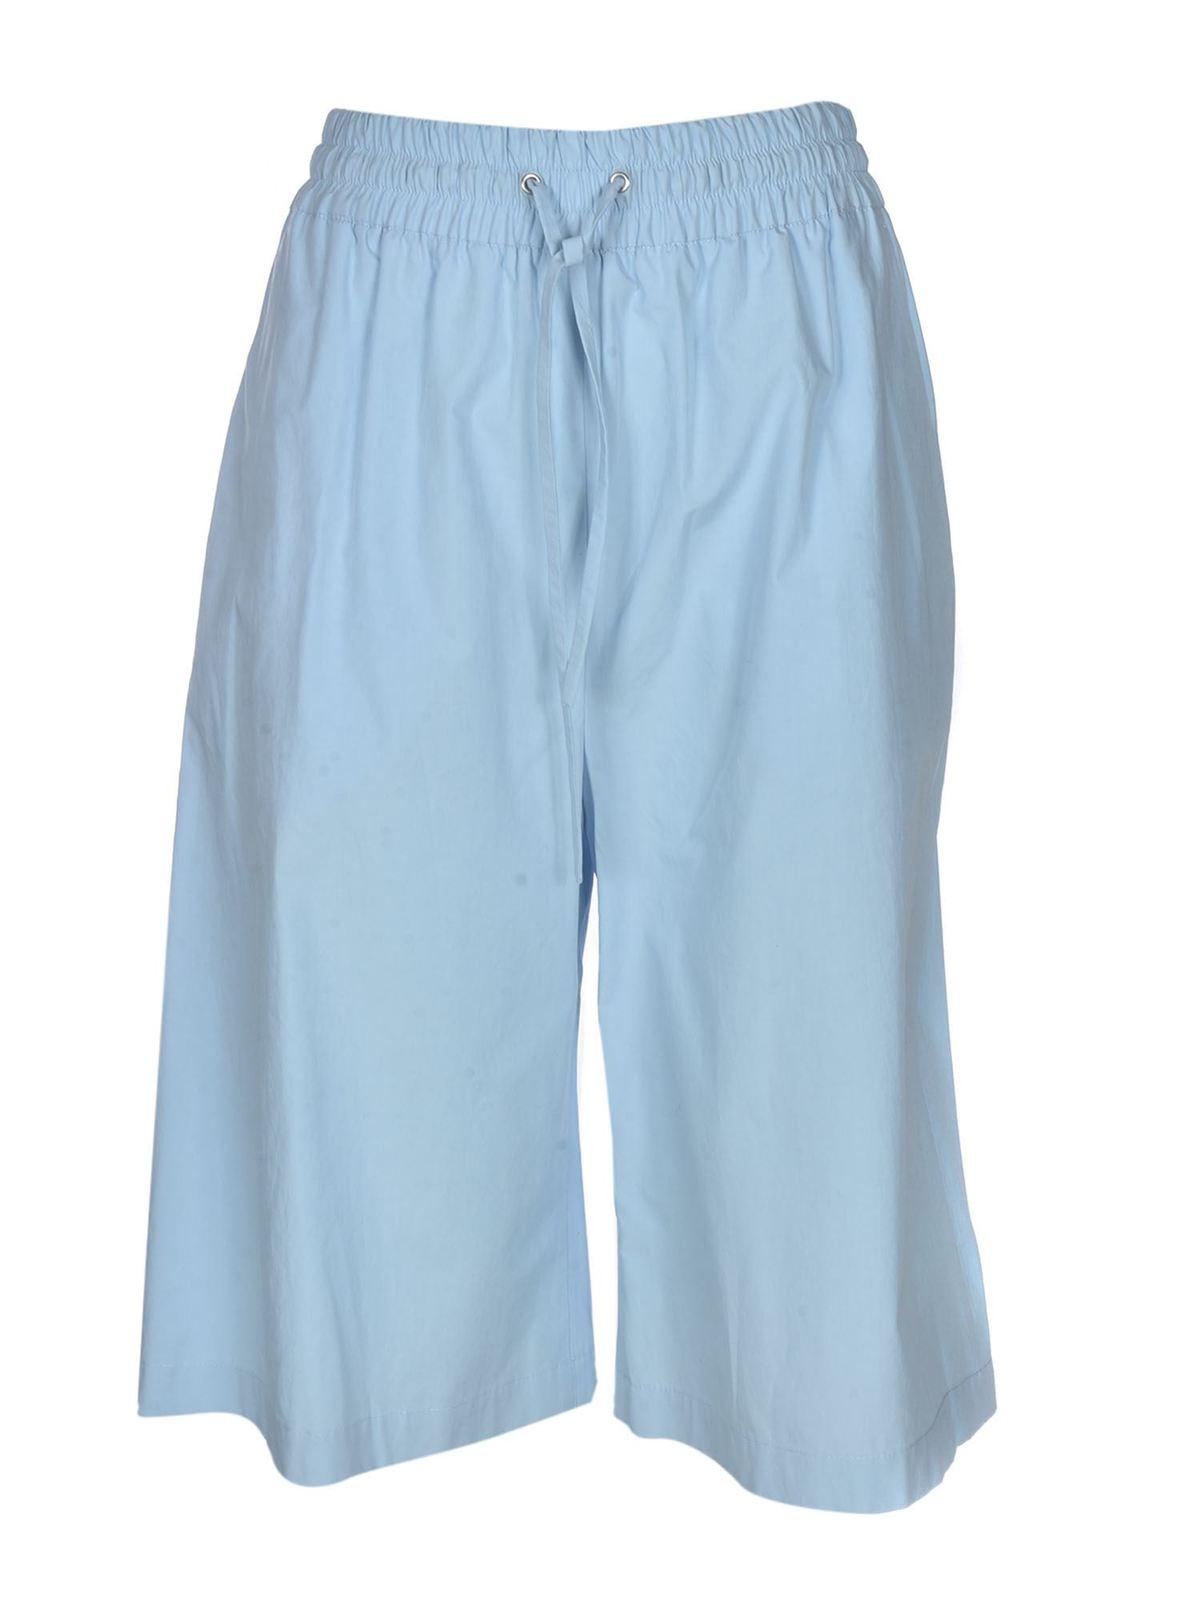 Msgm Cottons HIGH WAIST BERMUDA SHORTS IN LIGHT BLUE